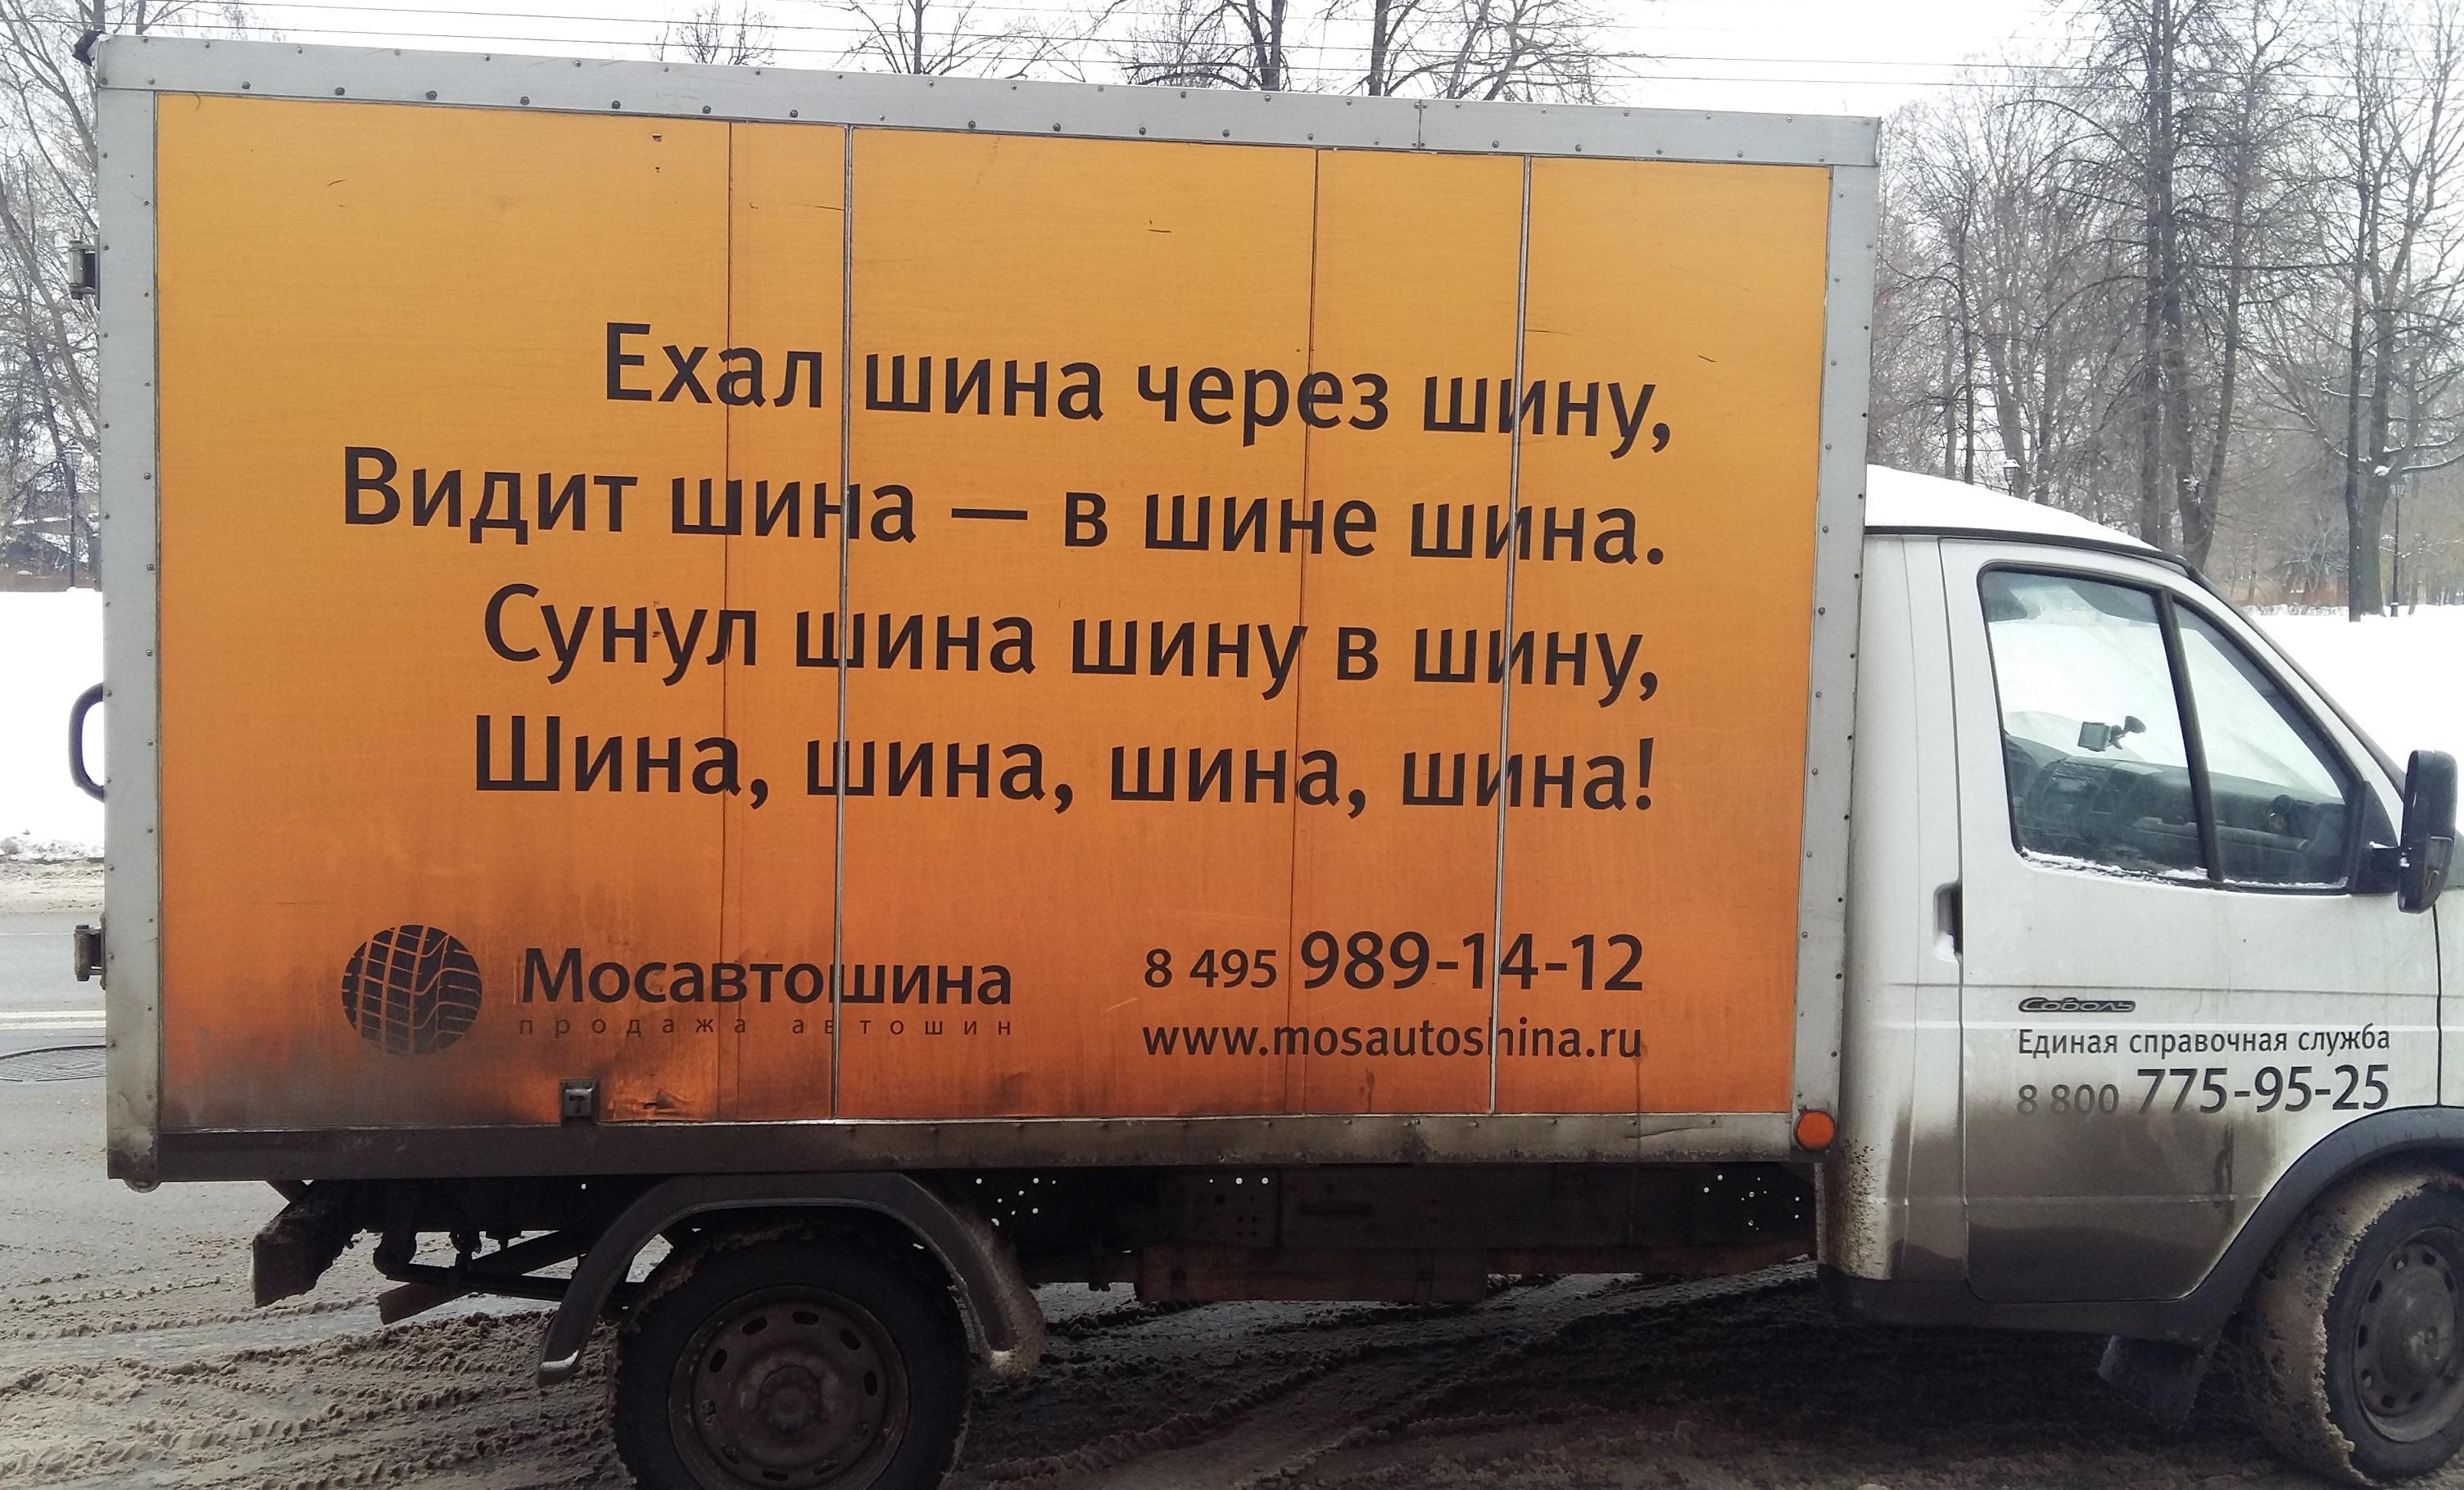 https://infovend.ru/forum/uploads/monthly_2017_01/58752e1369952_.jpg.818c5c1fbb011a11ab9f59c6cf7d6e3a.jpg